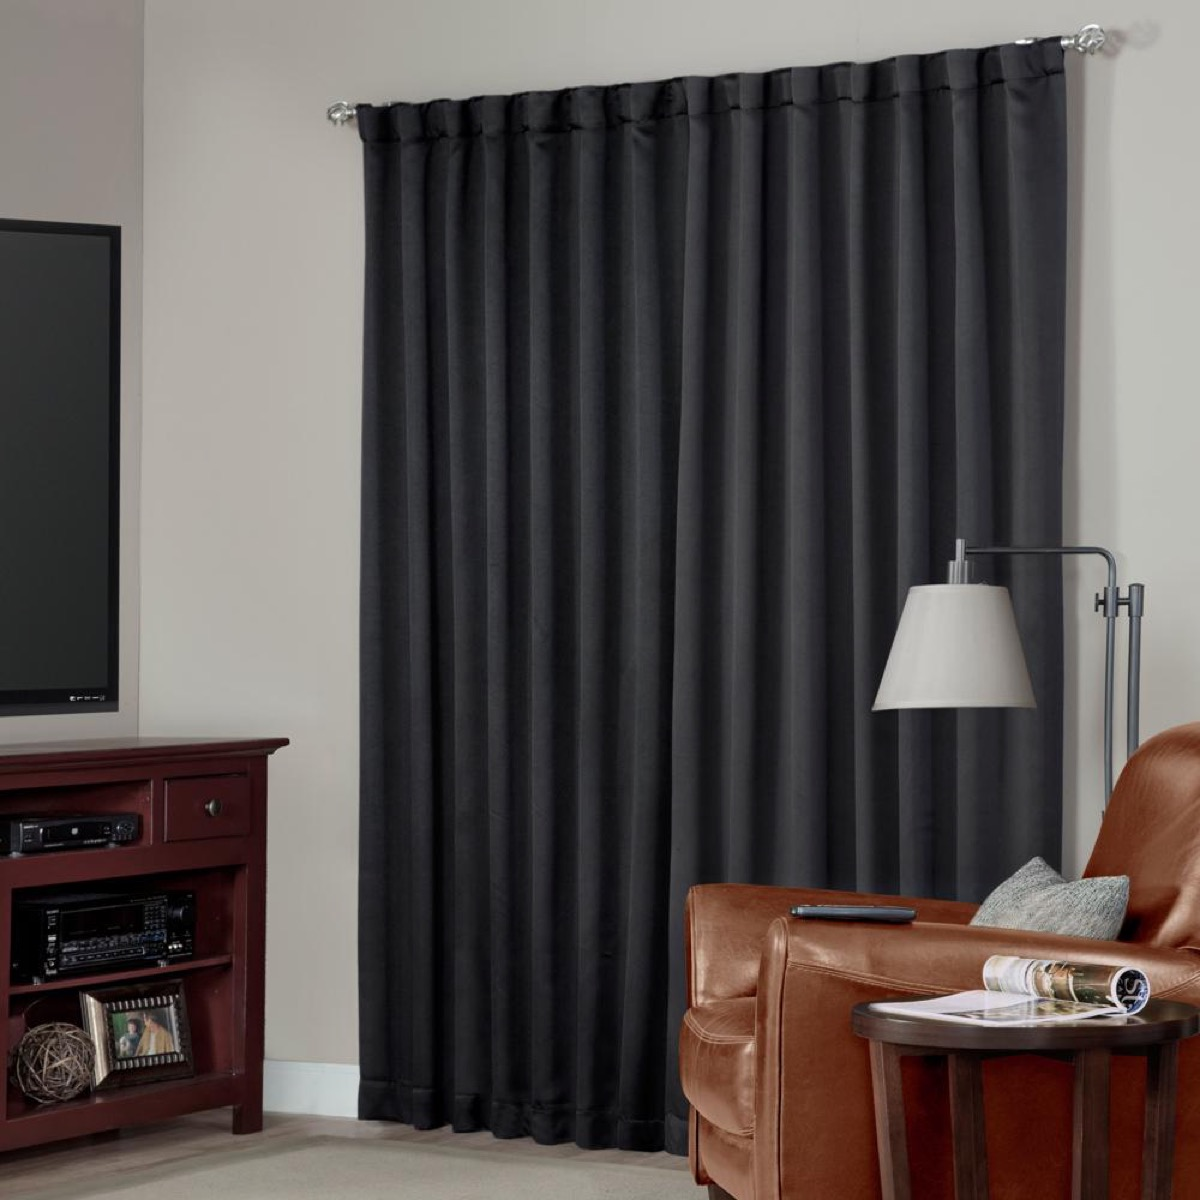 gray room with dark gray blackout curtains, better sleep essentials